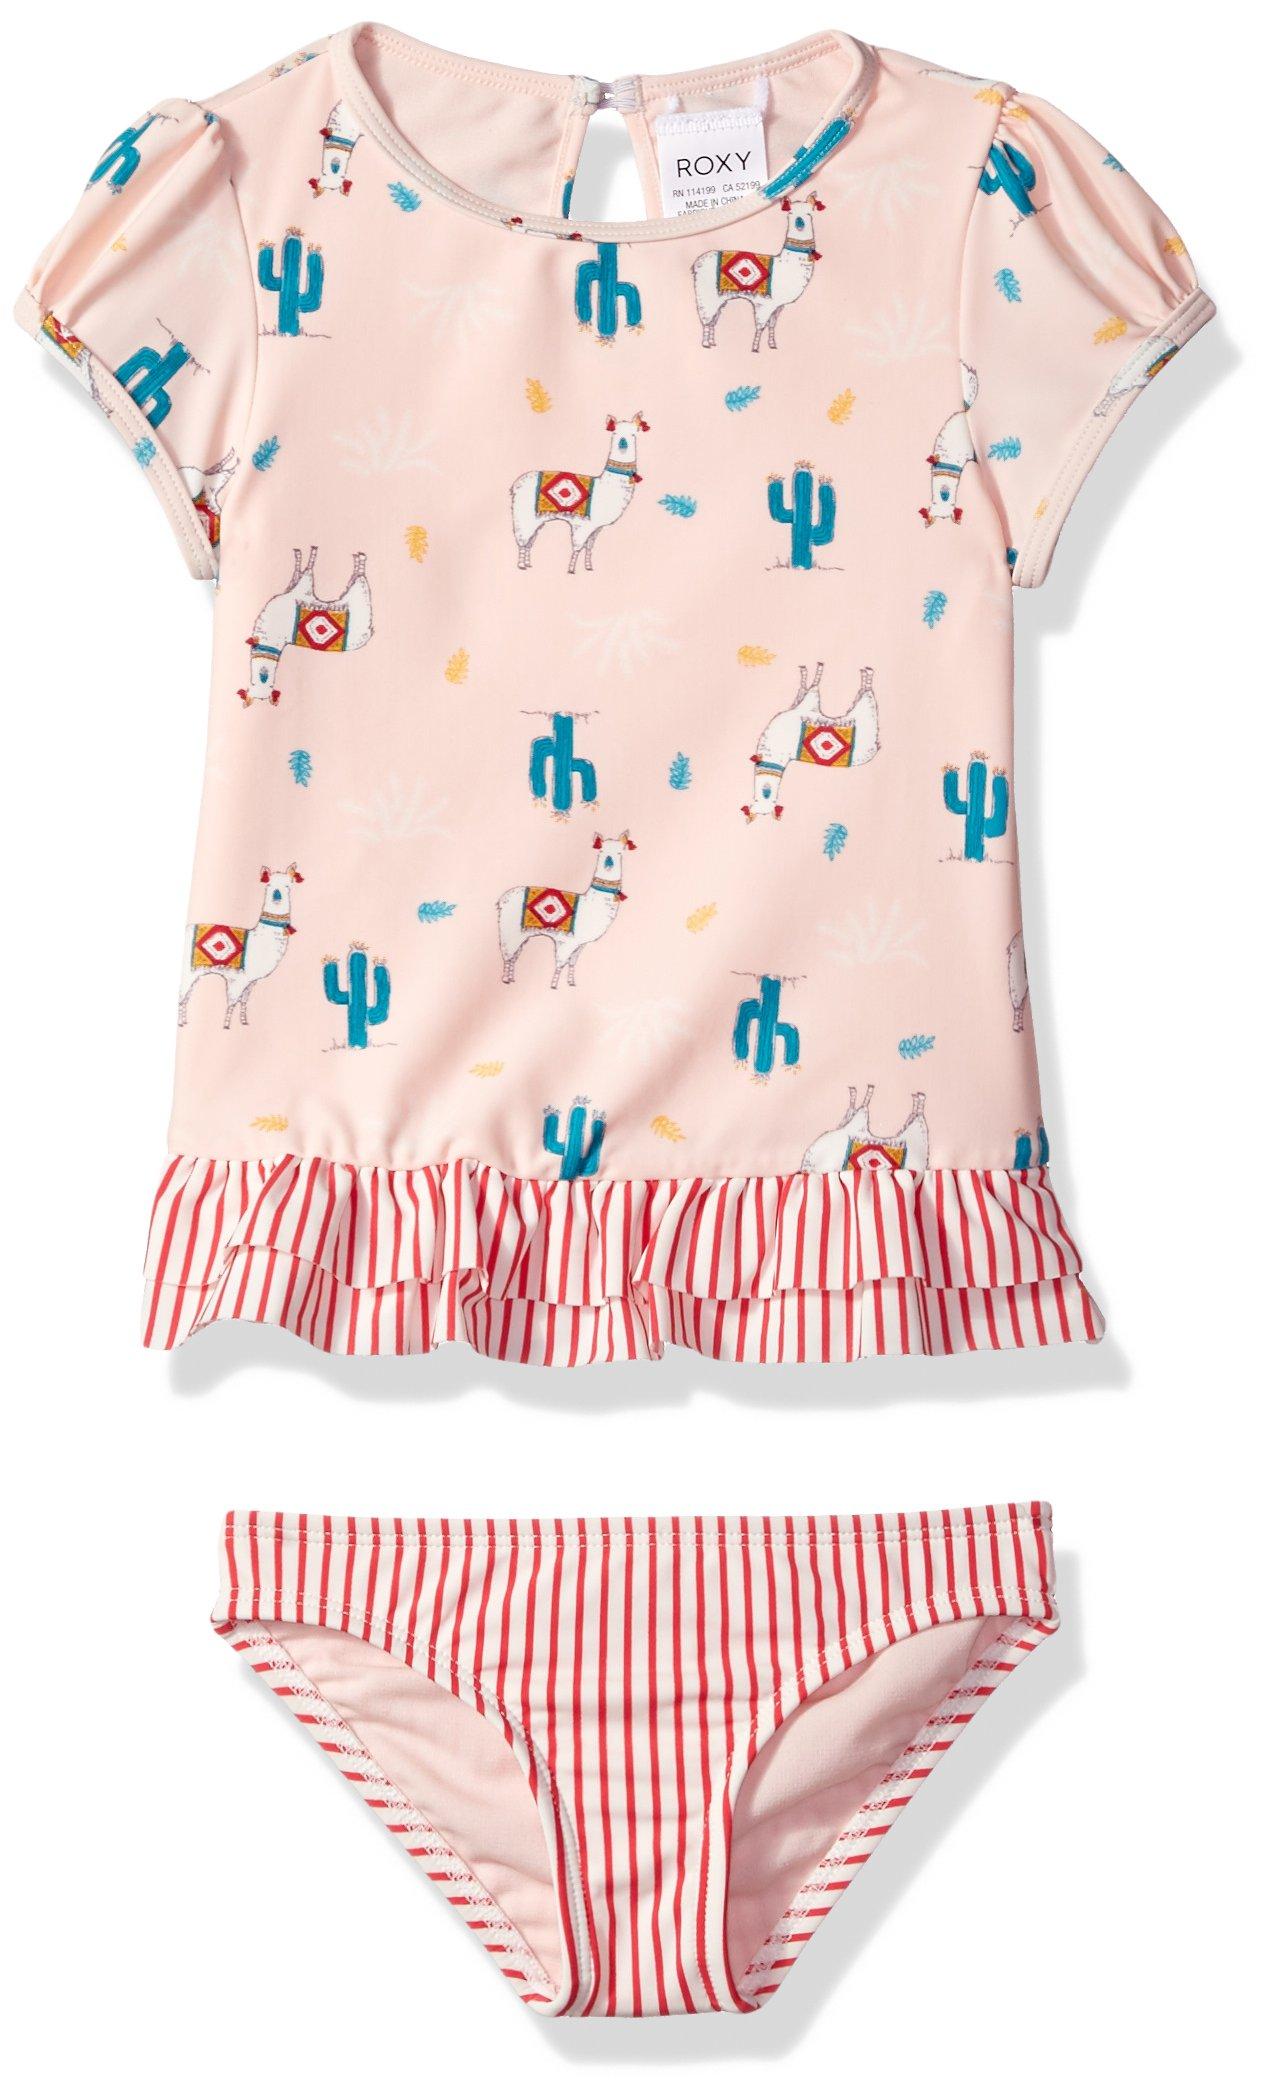 Roxy Little Girls' Cute Travel Fashion Short Sleeve Rashguard Set, Rose Quartz Swim Peru Travel, 5